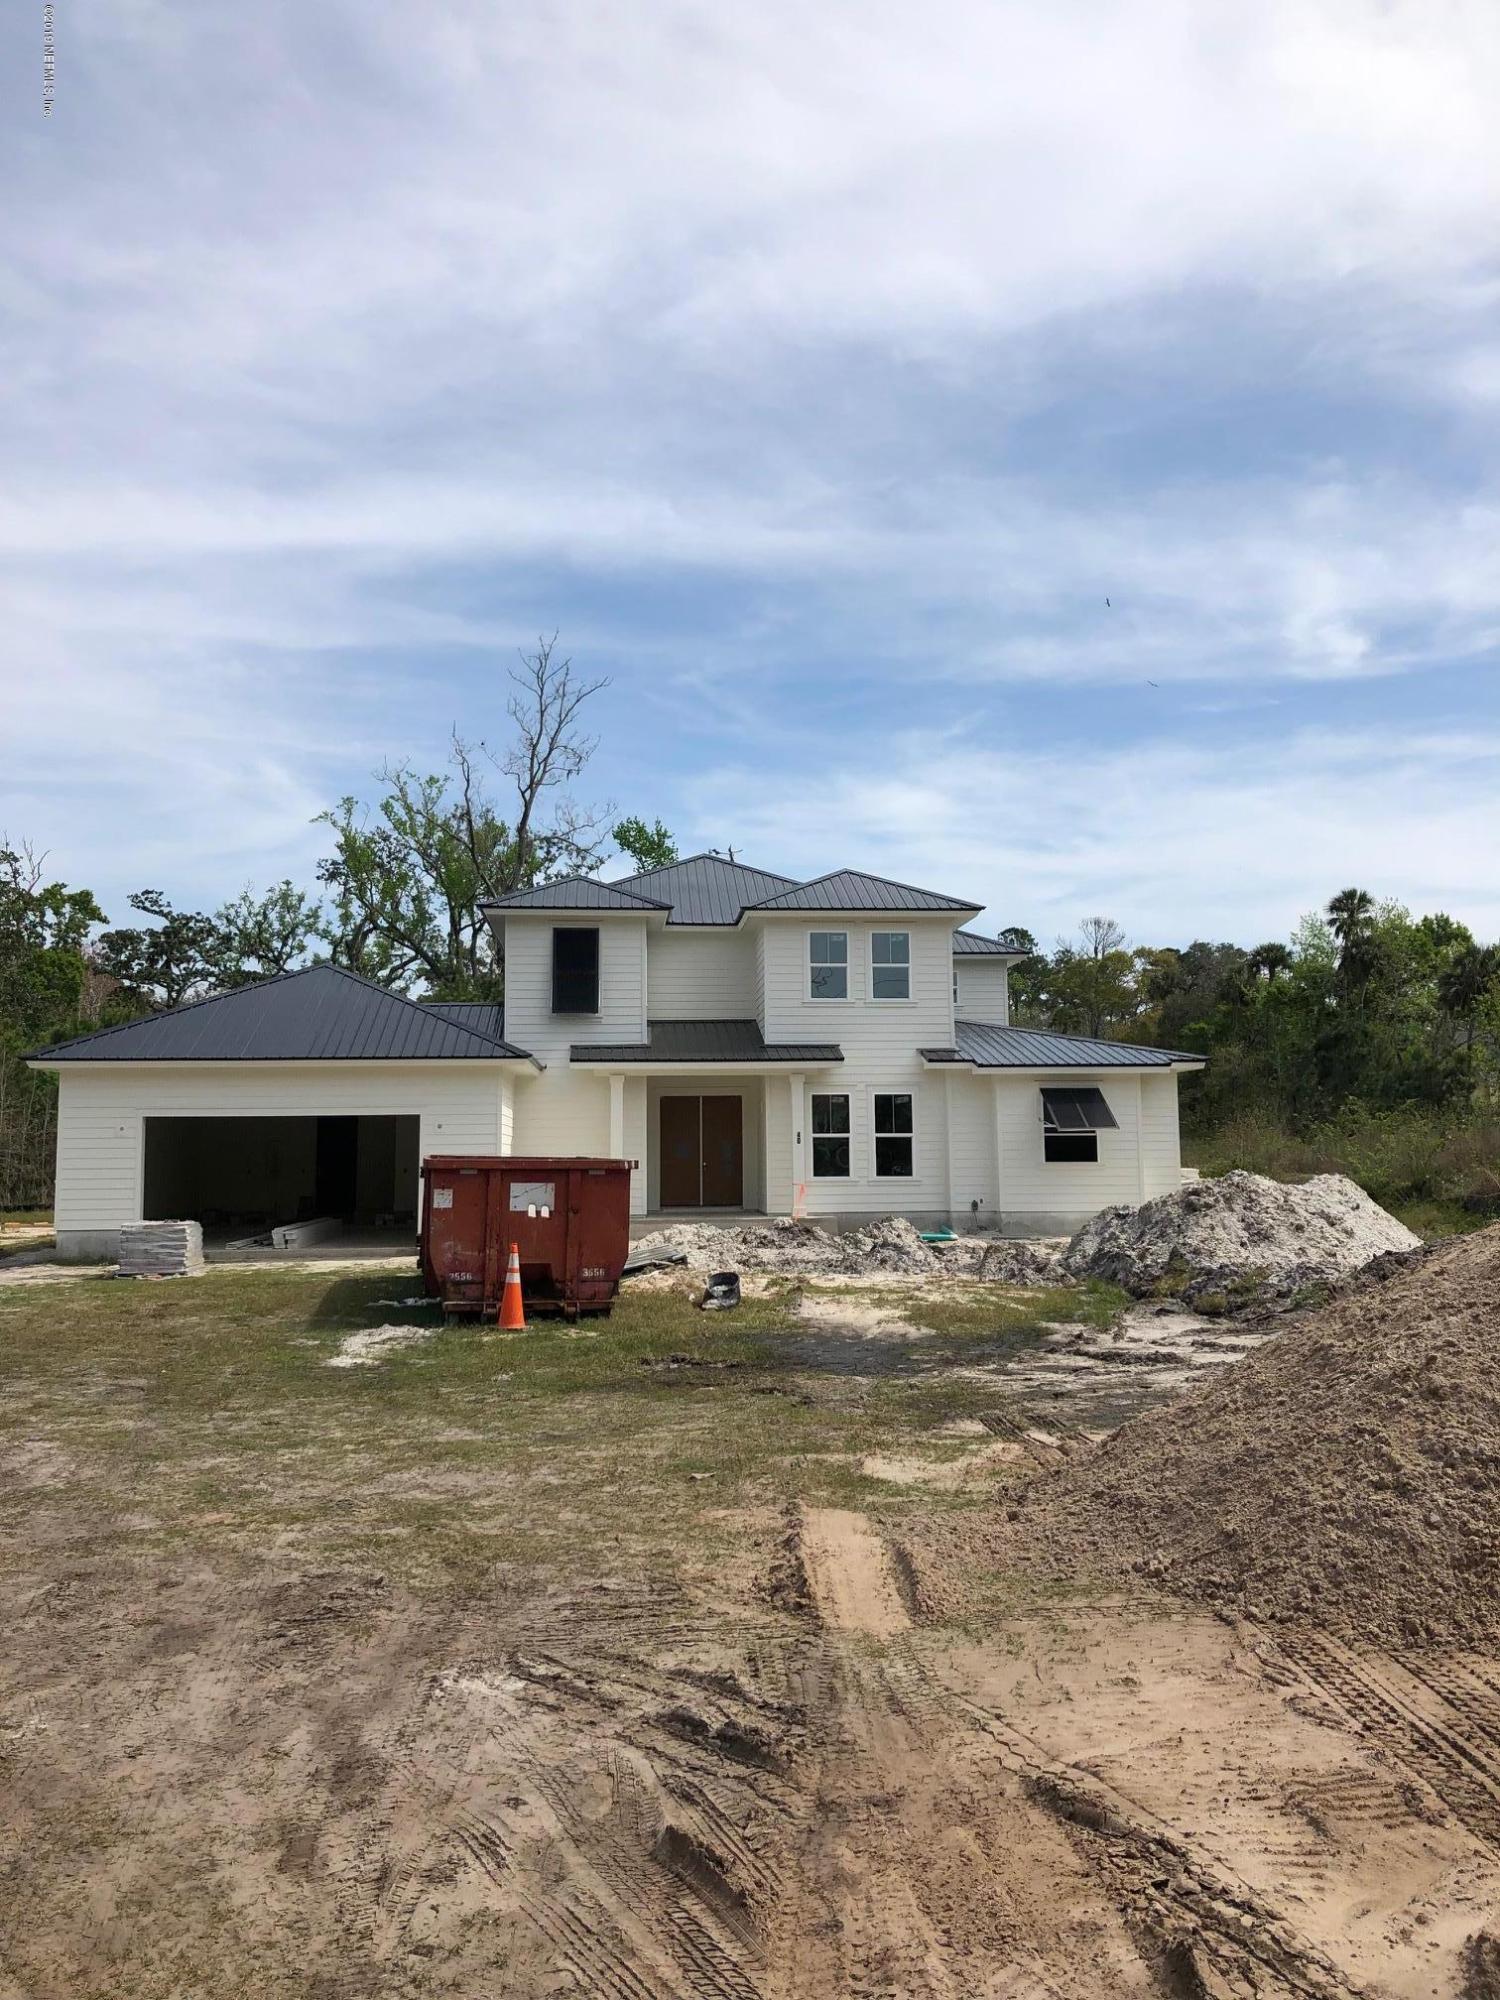 40 N ROSCOE BLVD, Ponte Vedra, Florida